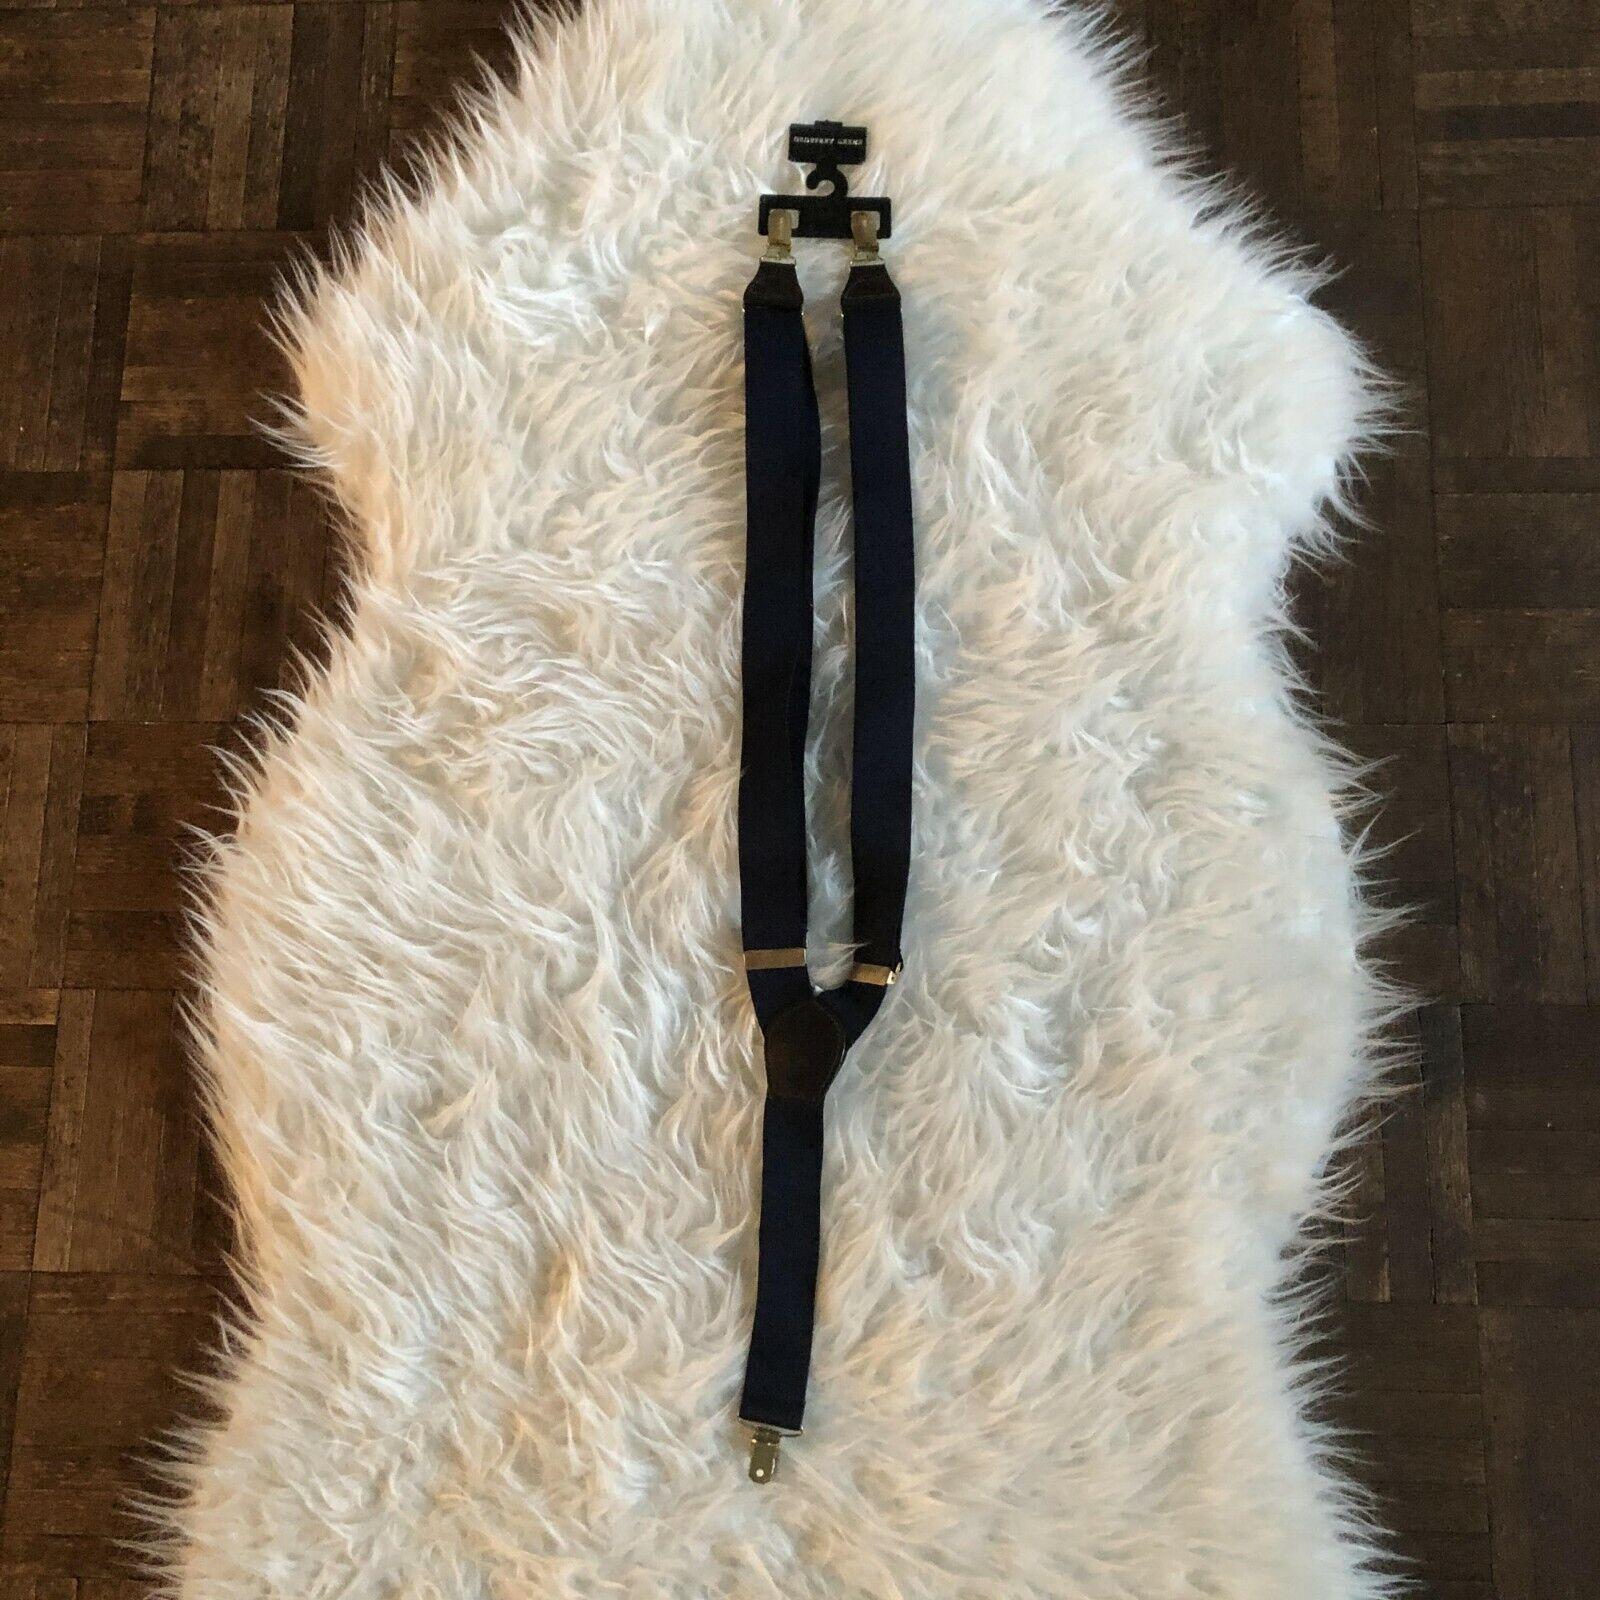 Geoffrey Beene Leather End Suspenders Navy Blue NEW